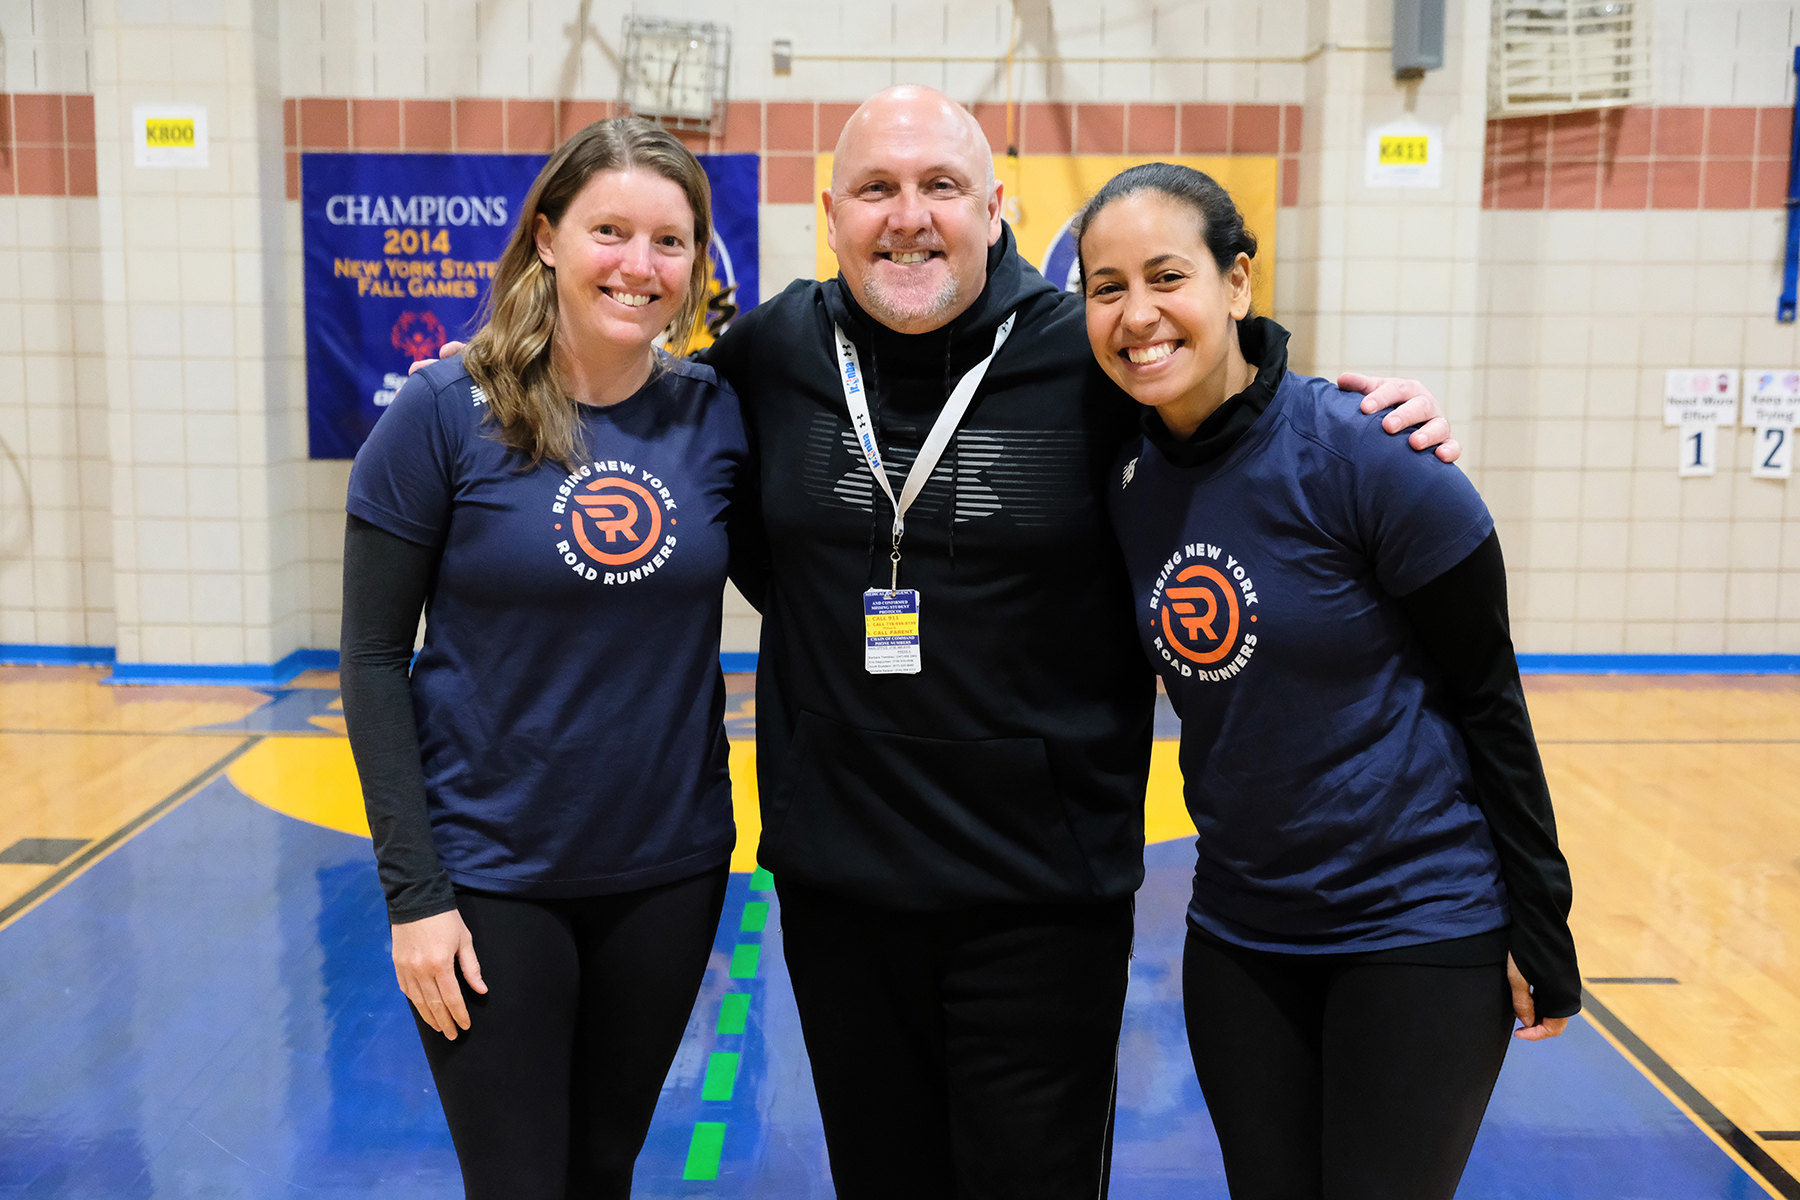 2019 Big Apple Award winner Doug Rebecca with NYRR's Caitlin Francisco and Lydia Gonzalez